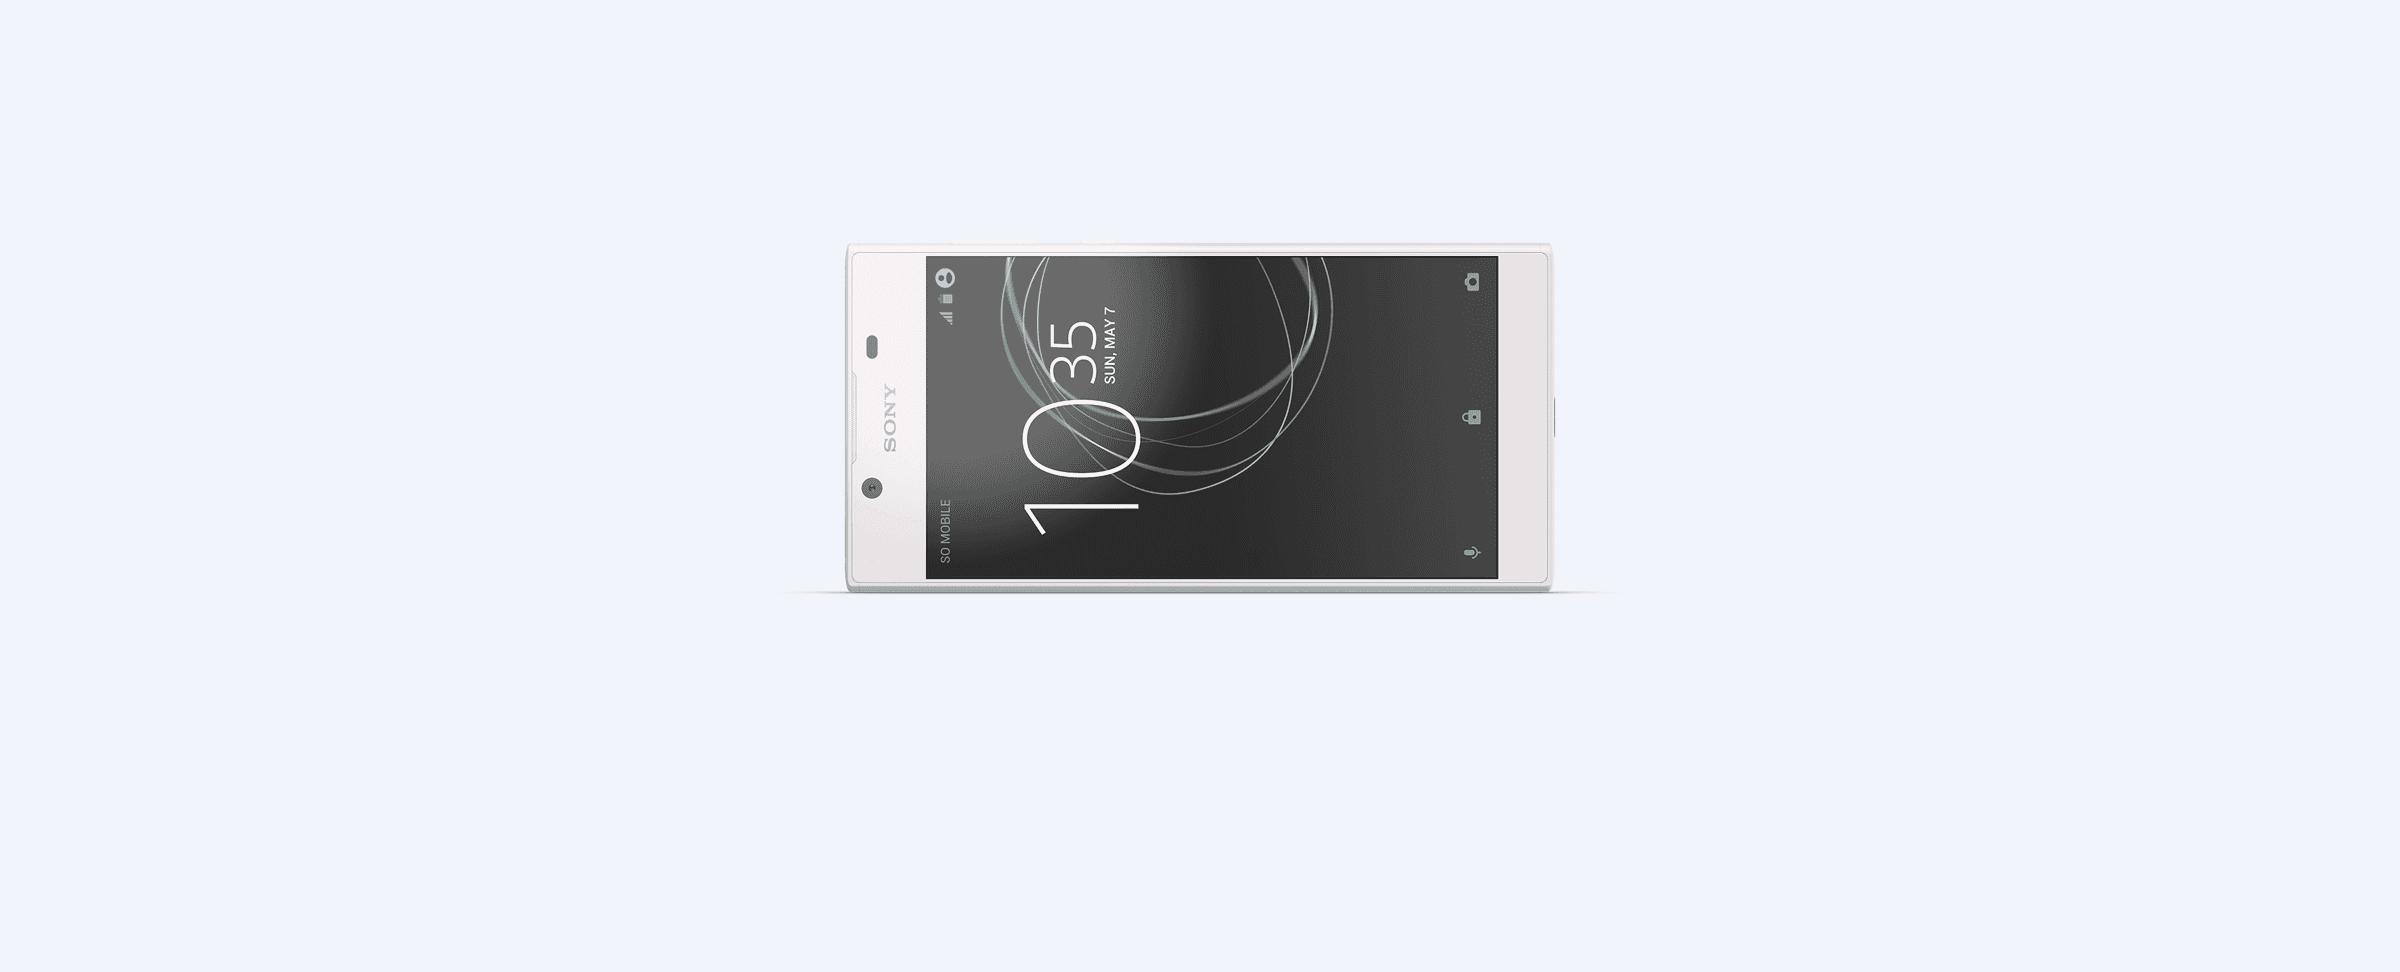 Sony Xperia L1 4